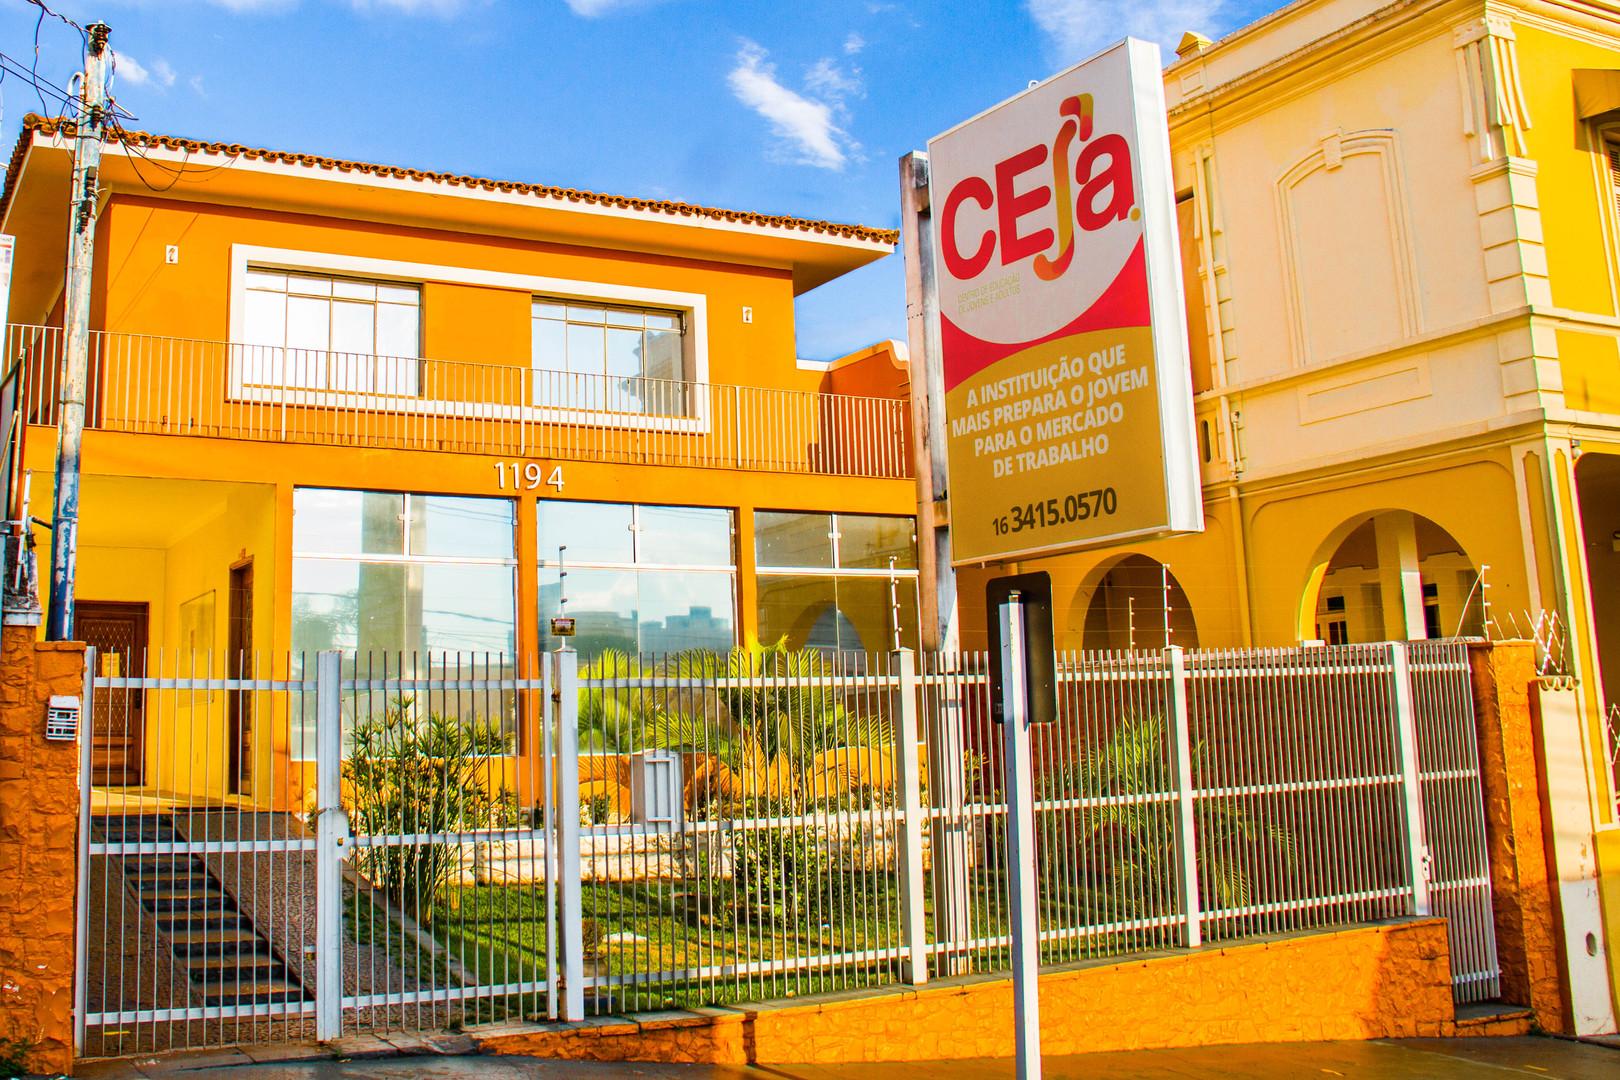 Ceja São Carlos-SP